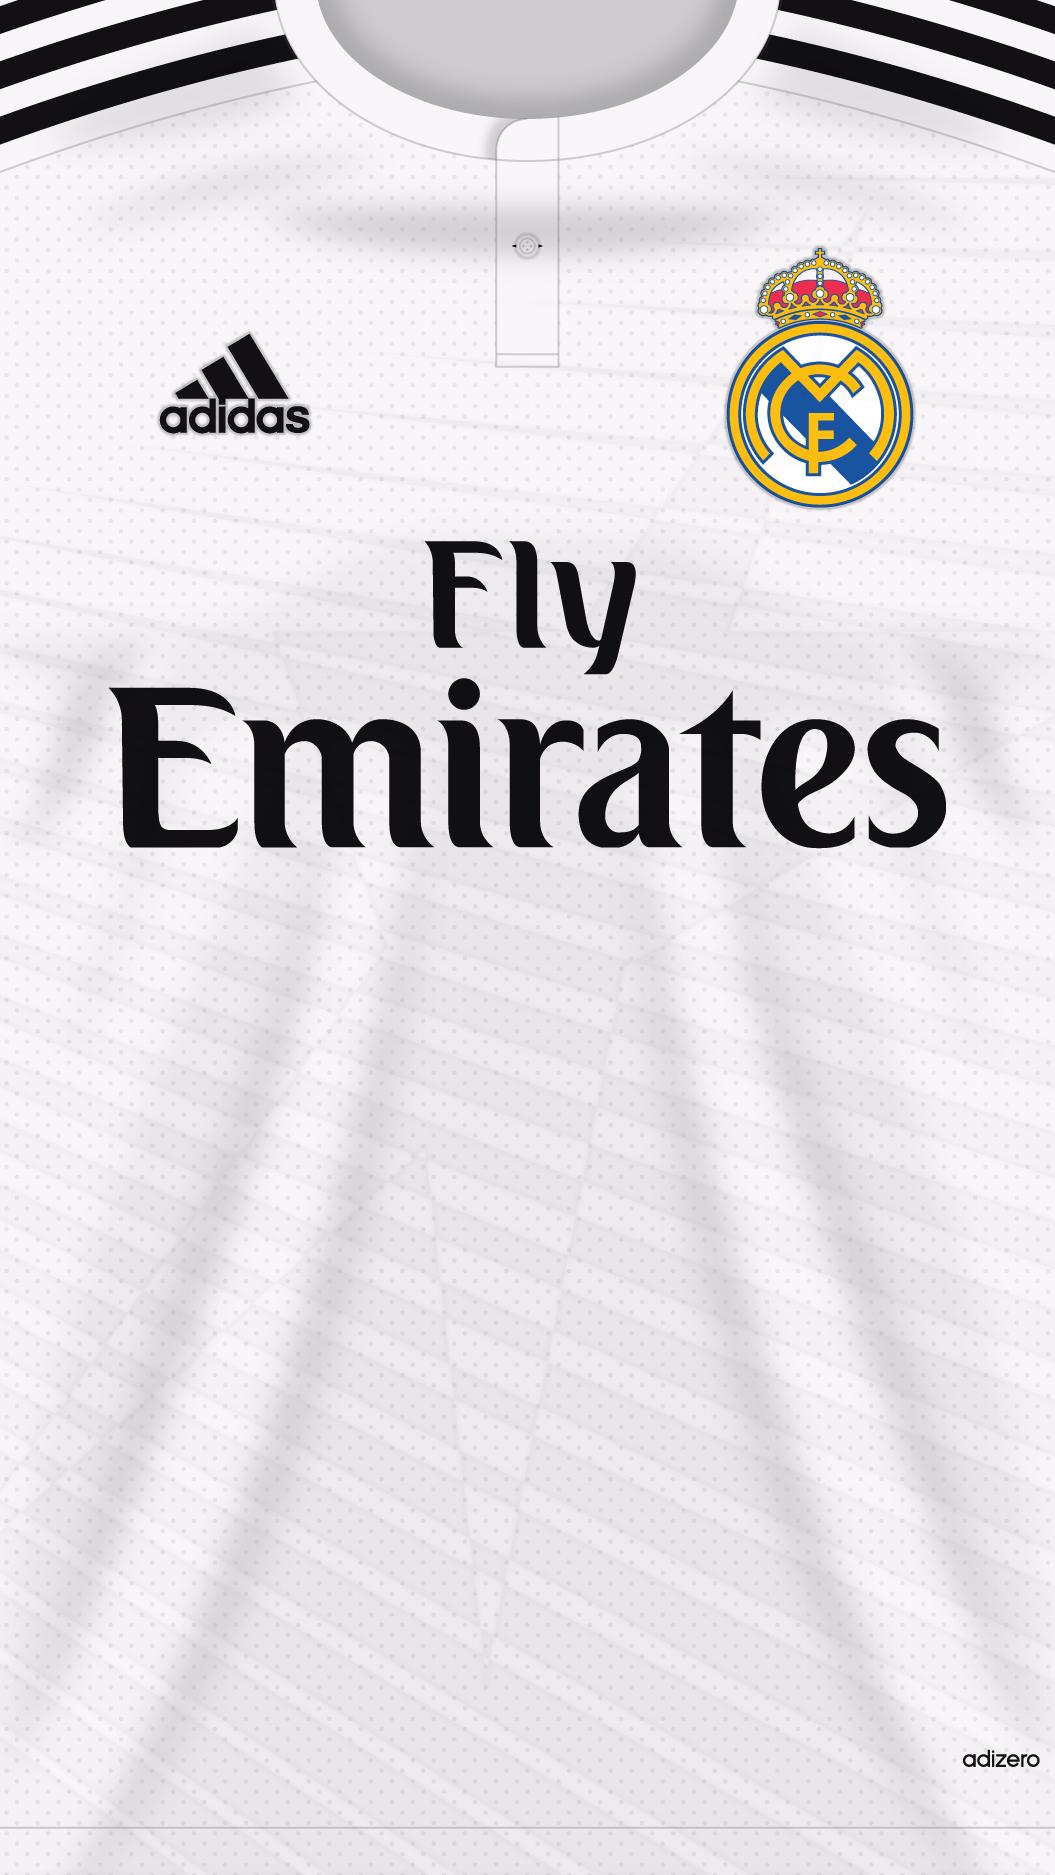 Real Madrid Uniform iphone 7 - 2018 Wallpapers HD | Wallpaper .